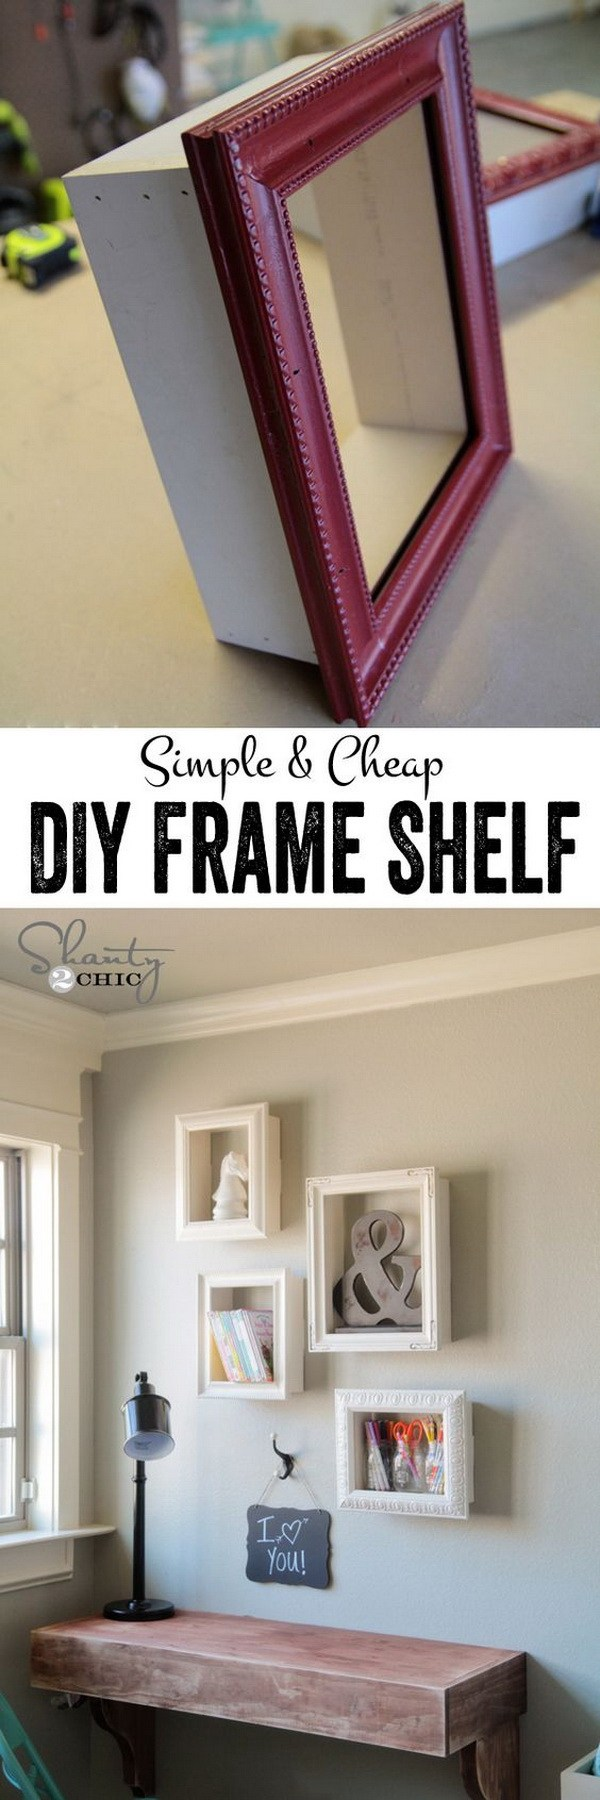 7. Simple DIY Frame Shelf